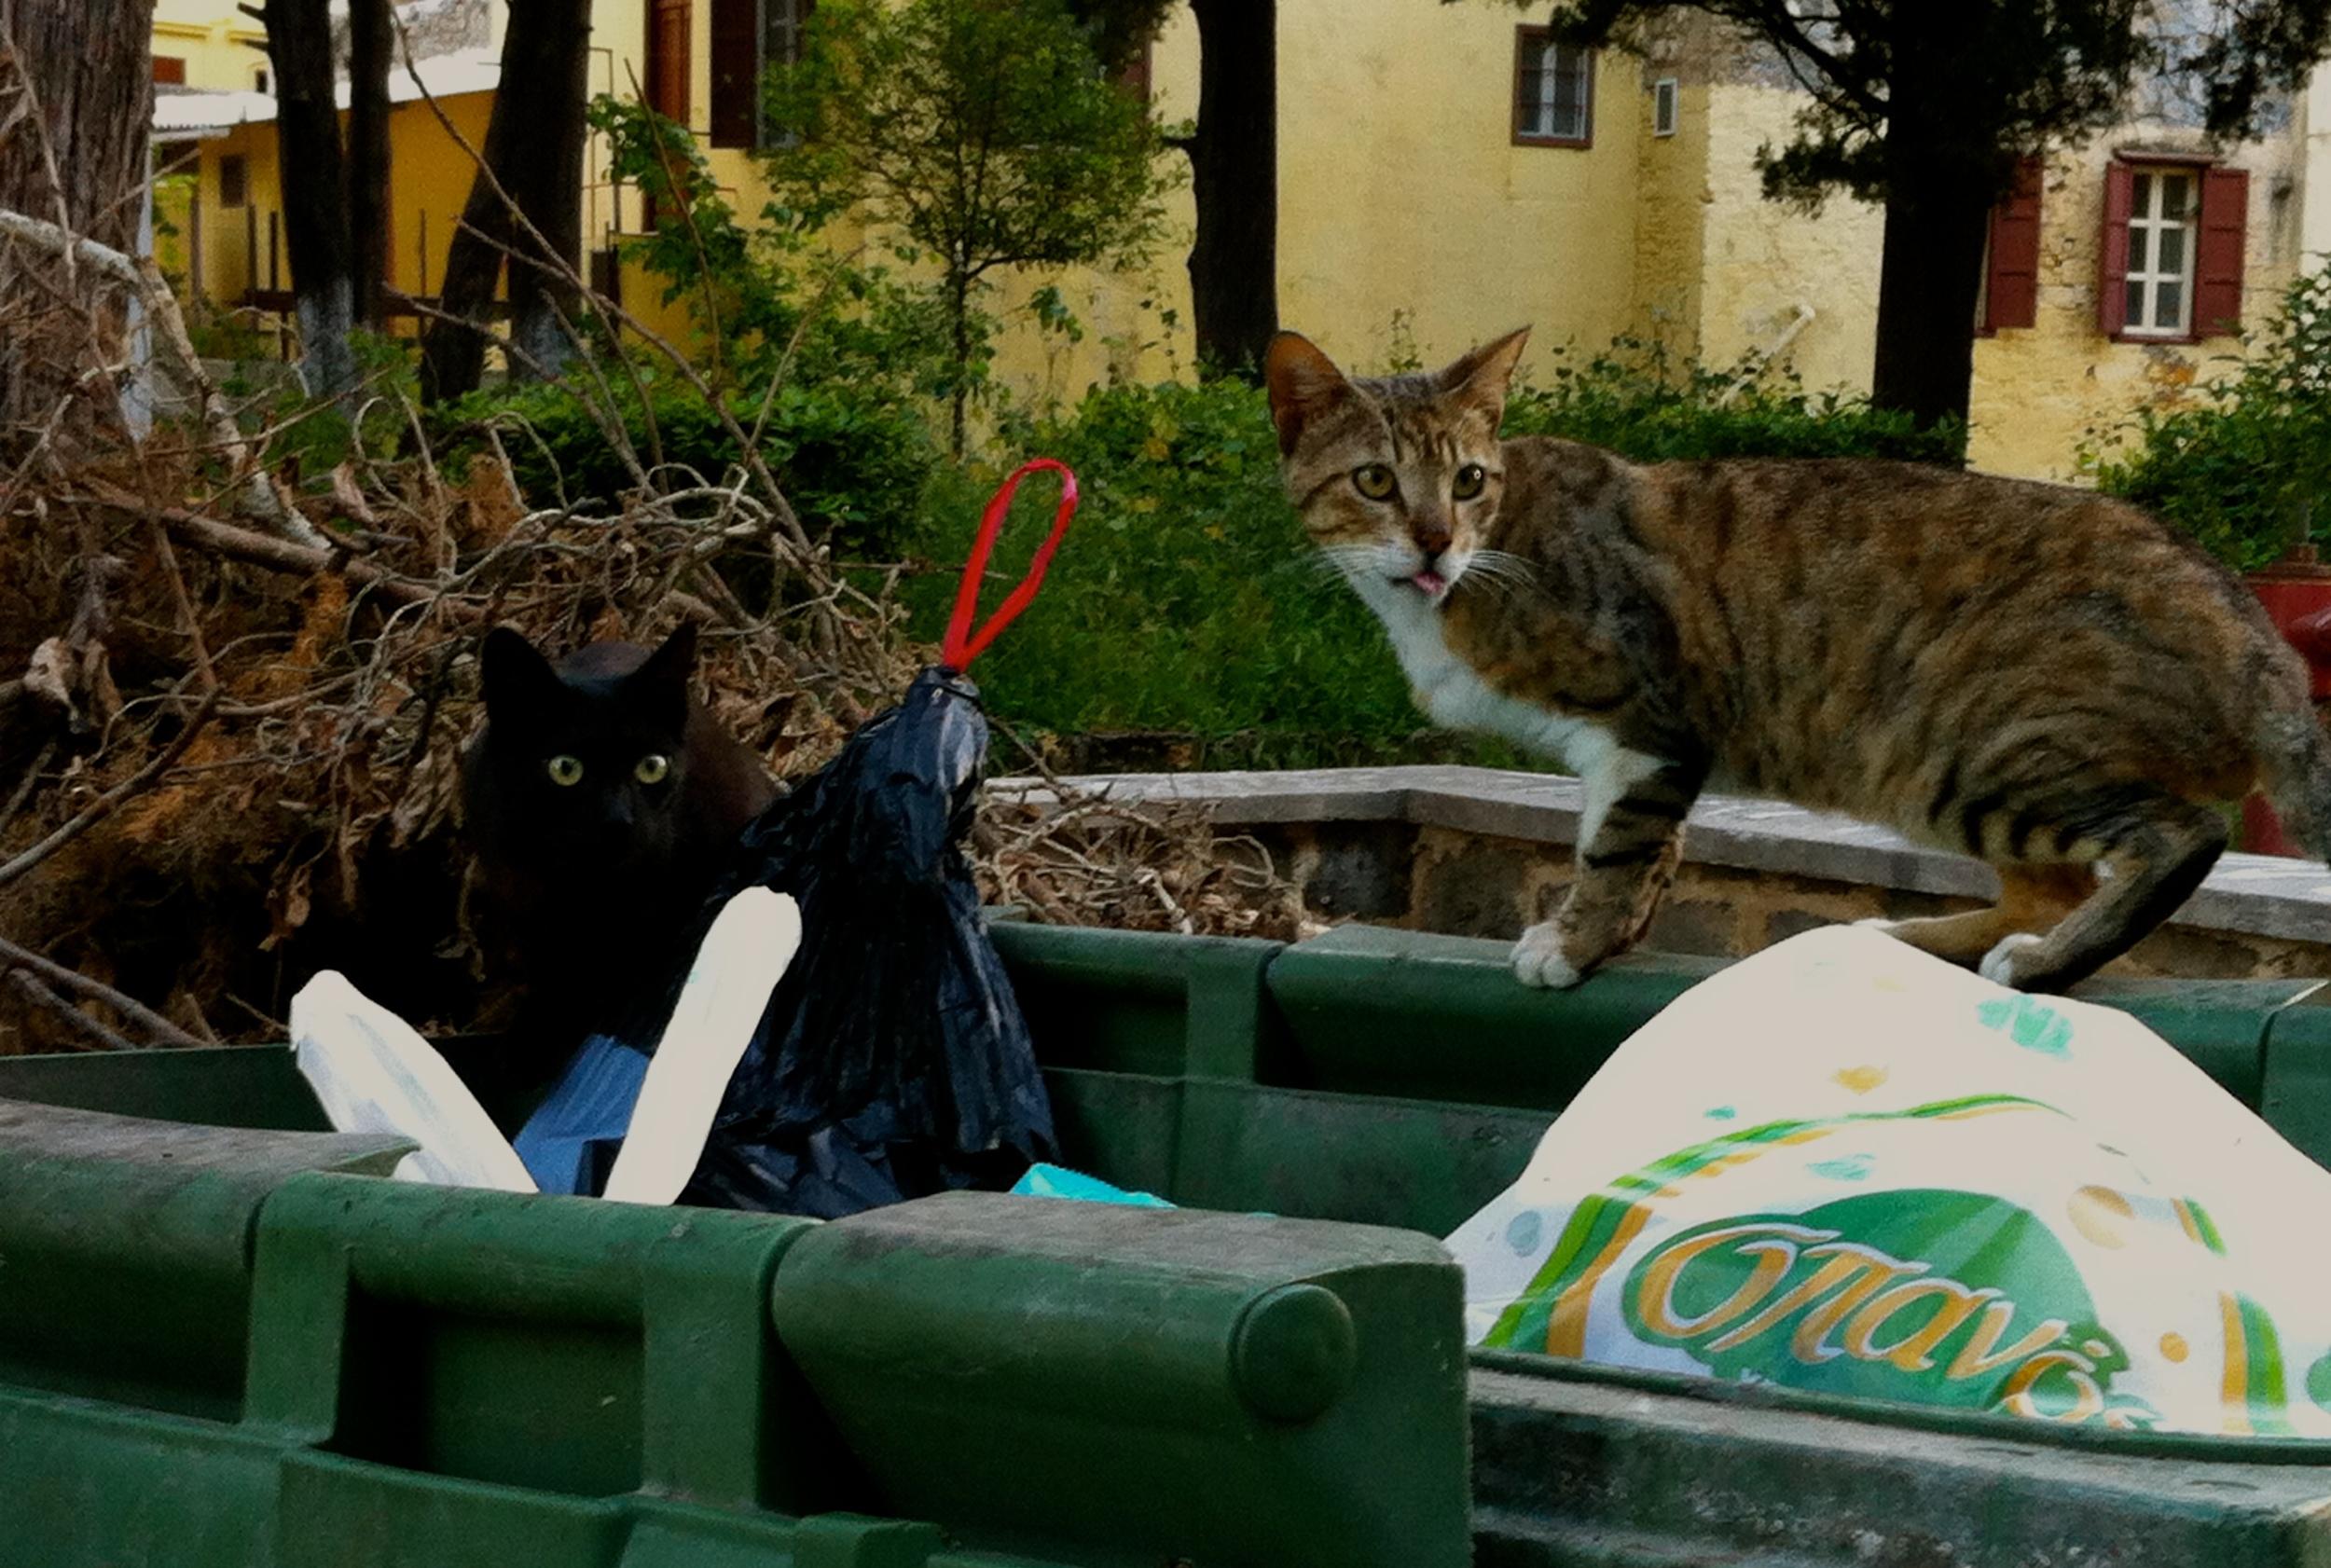 Straycats